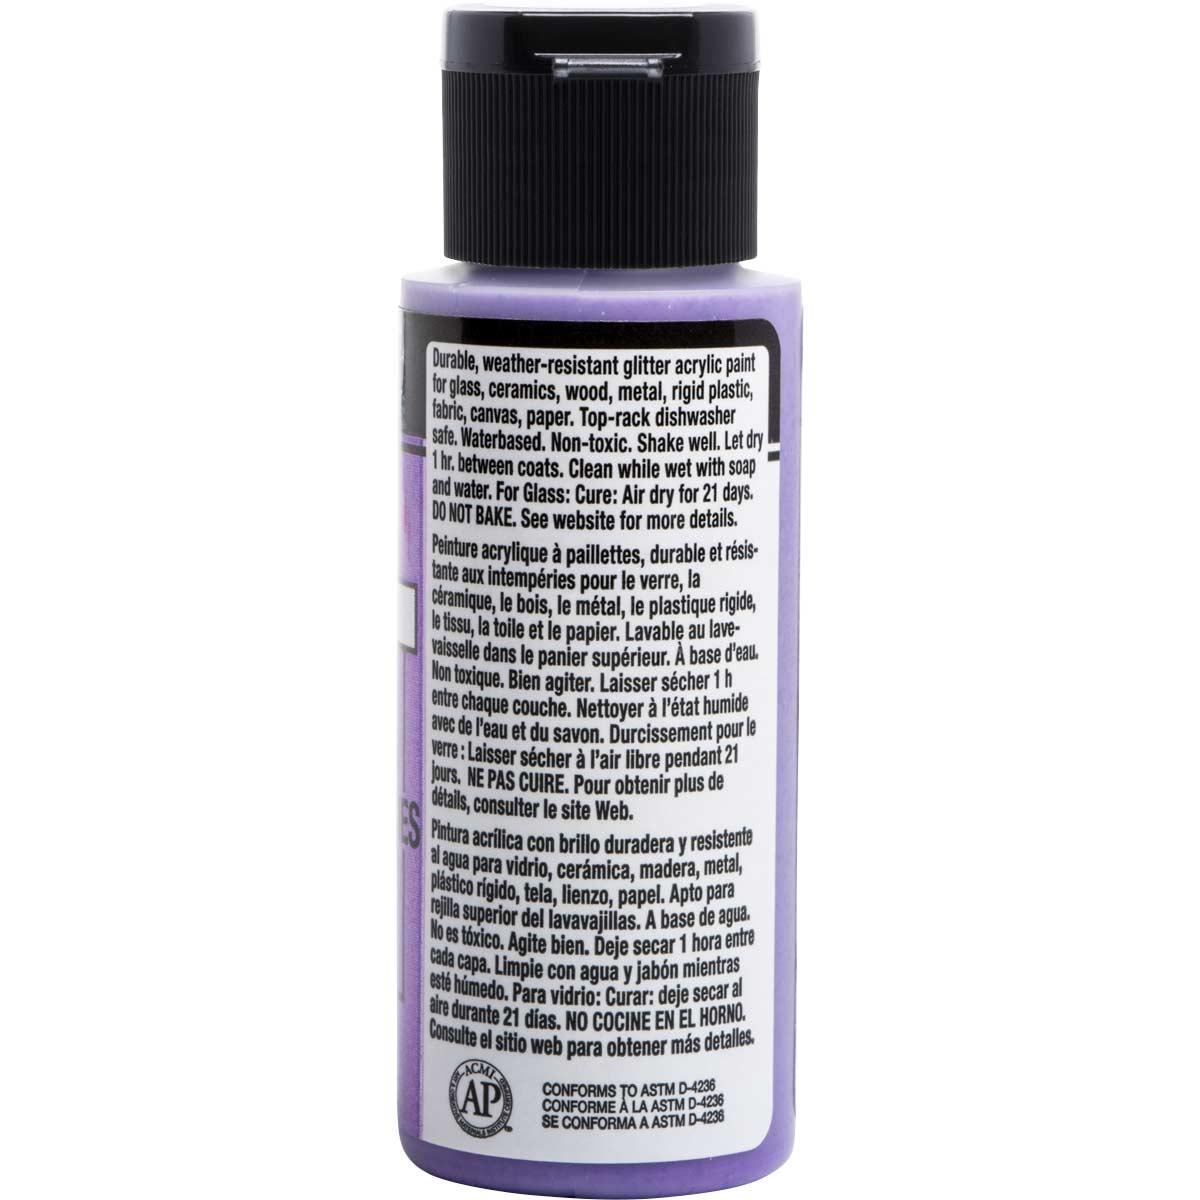 FolkArt ® Multi-Surface Glitter Acrylic Paints - Royal Purple, 2 oz. - 2962